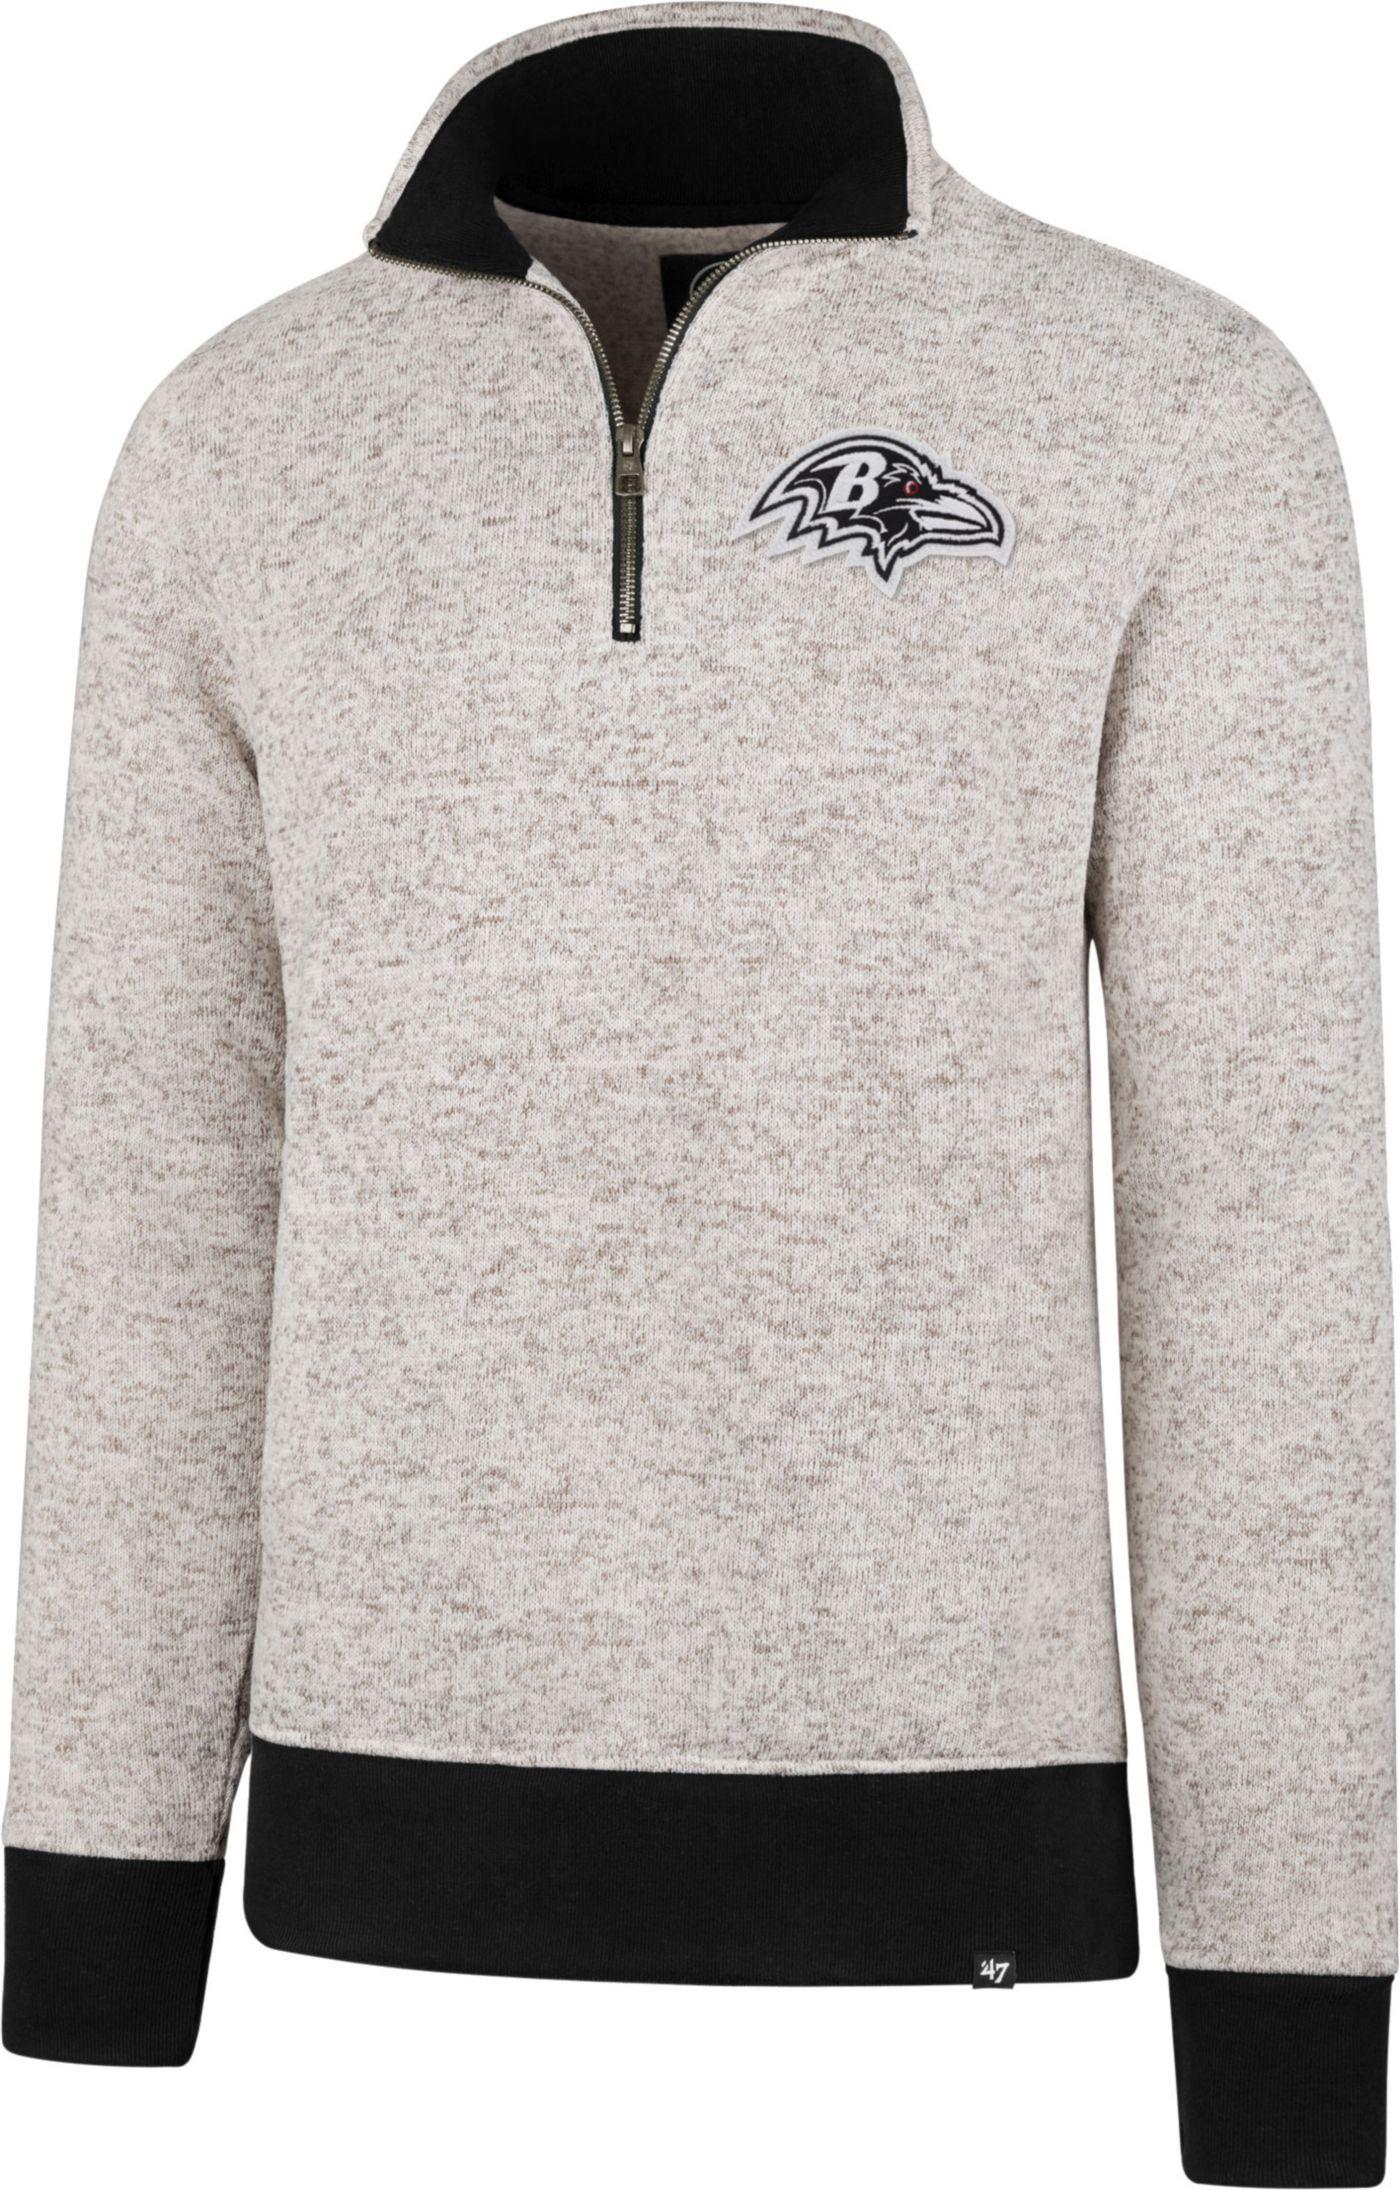 '47 Men's Baltimore Ravens Kodiak Quarter-Zip Grey Top